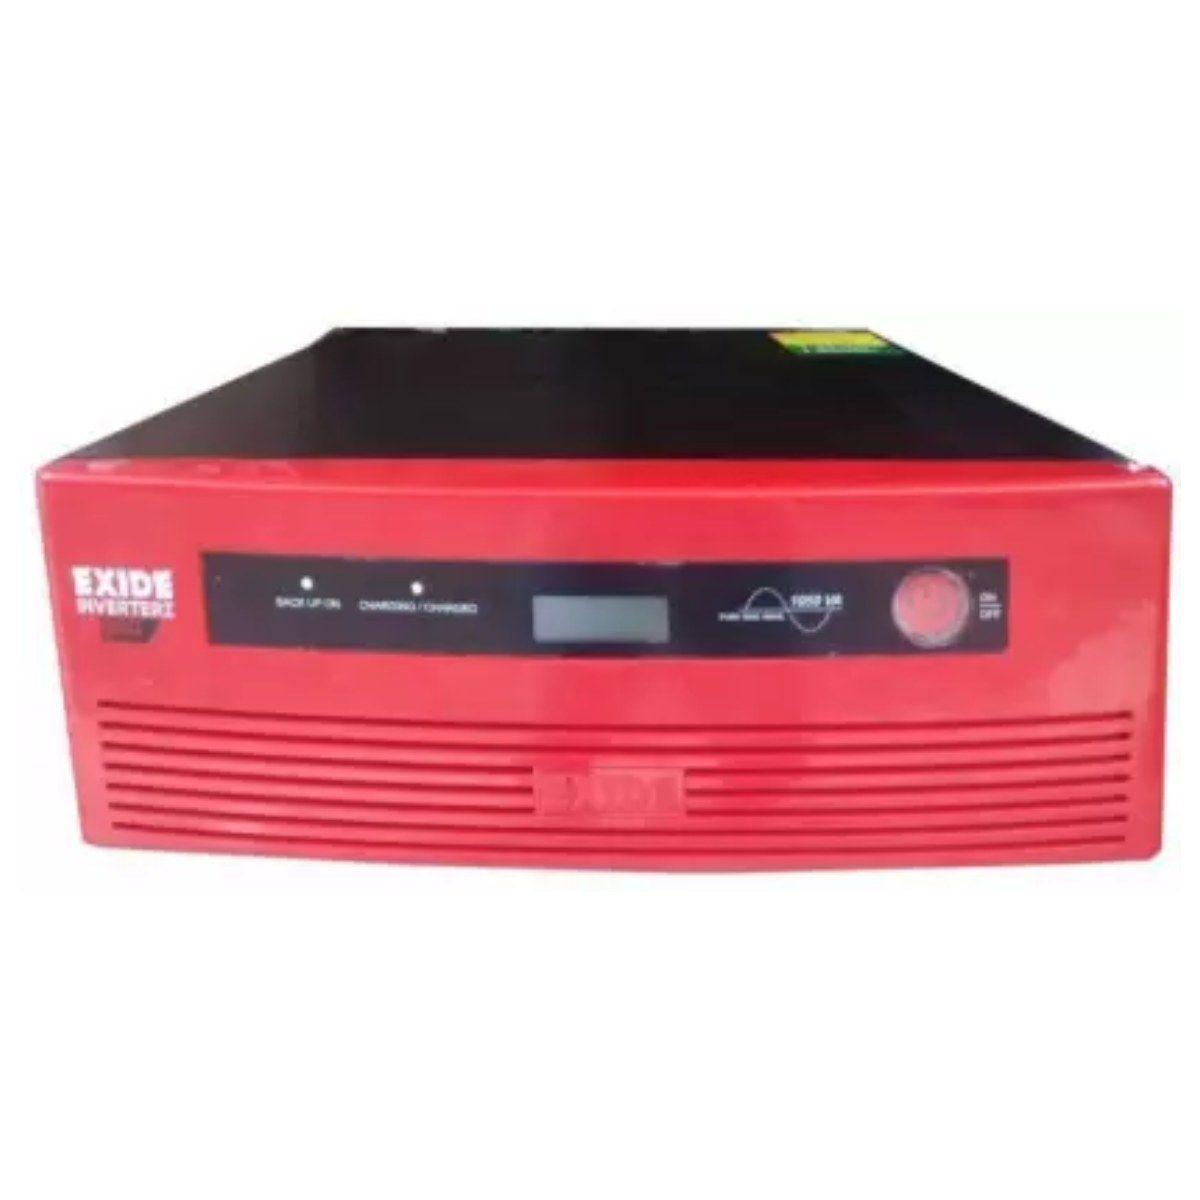 EXIDE GQP1050VA 1050VA Pure Sine Wave Inverter